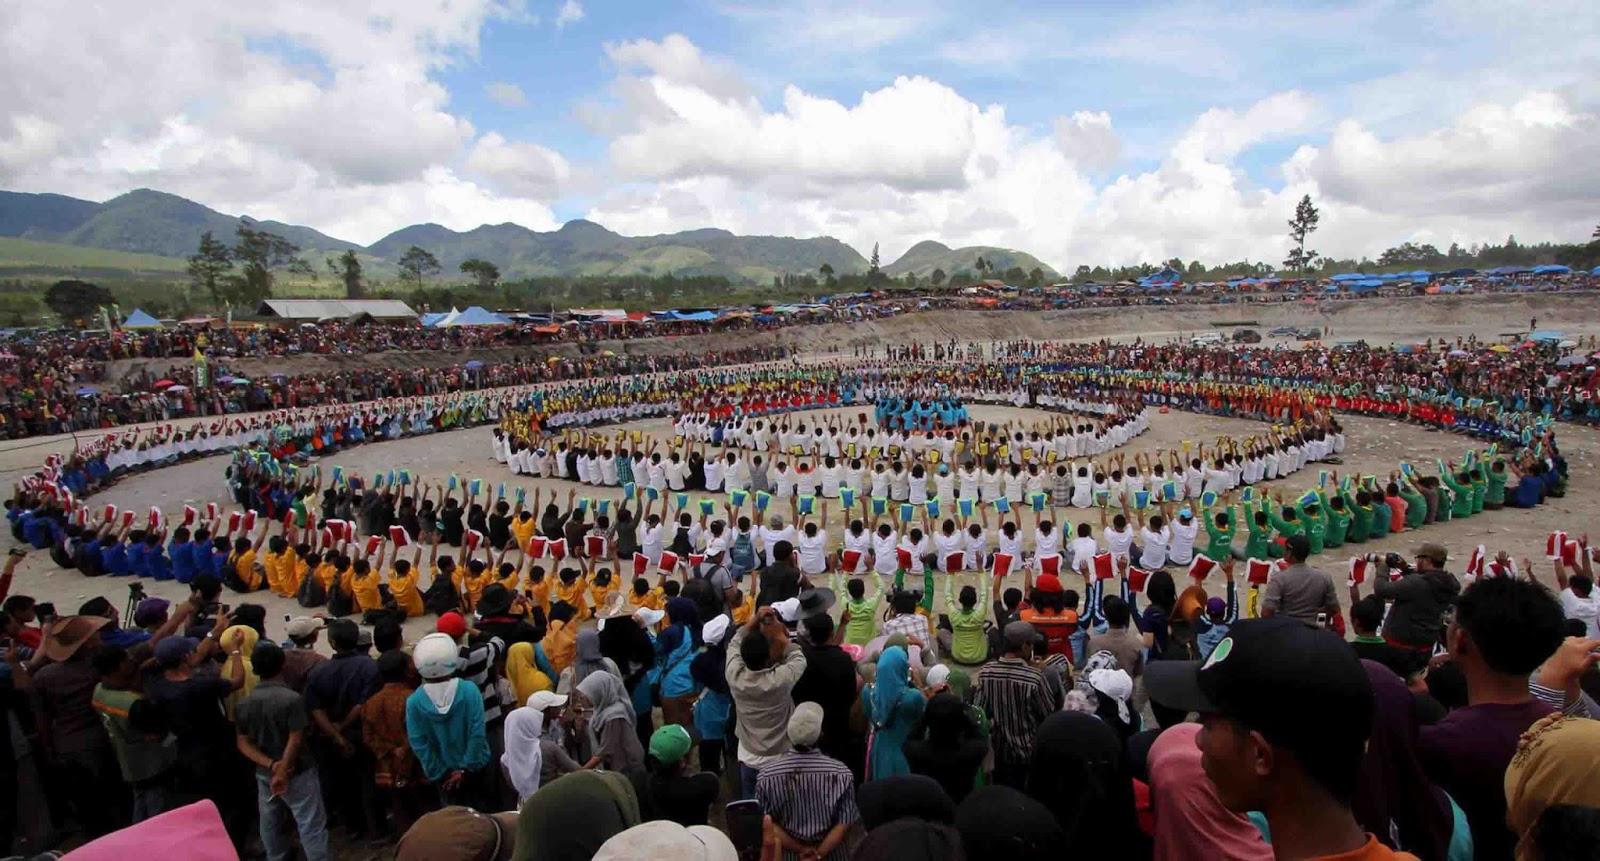 Didong, Kesenian Tradisional dari Aceh